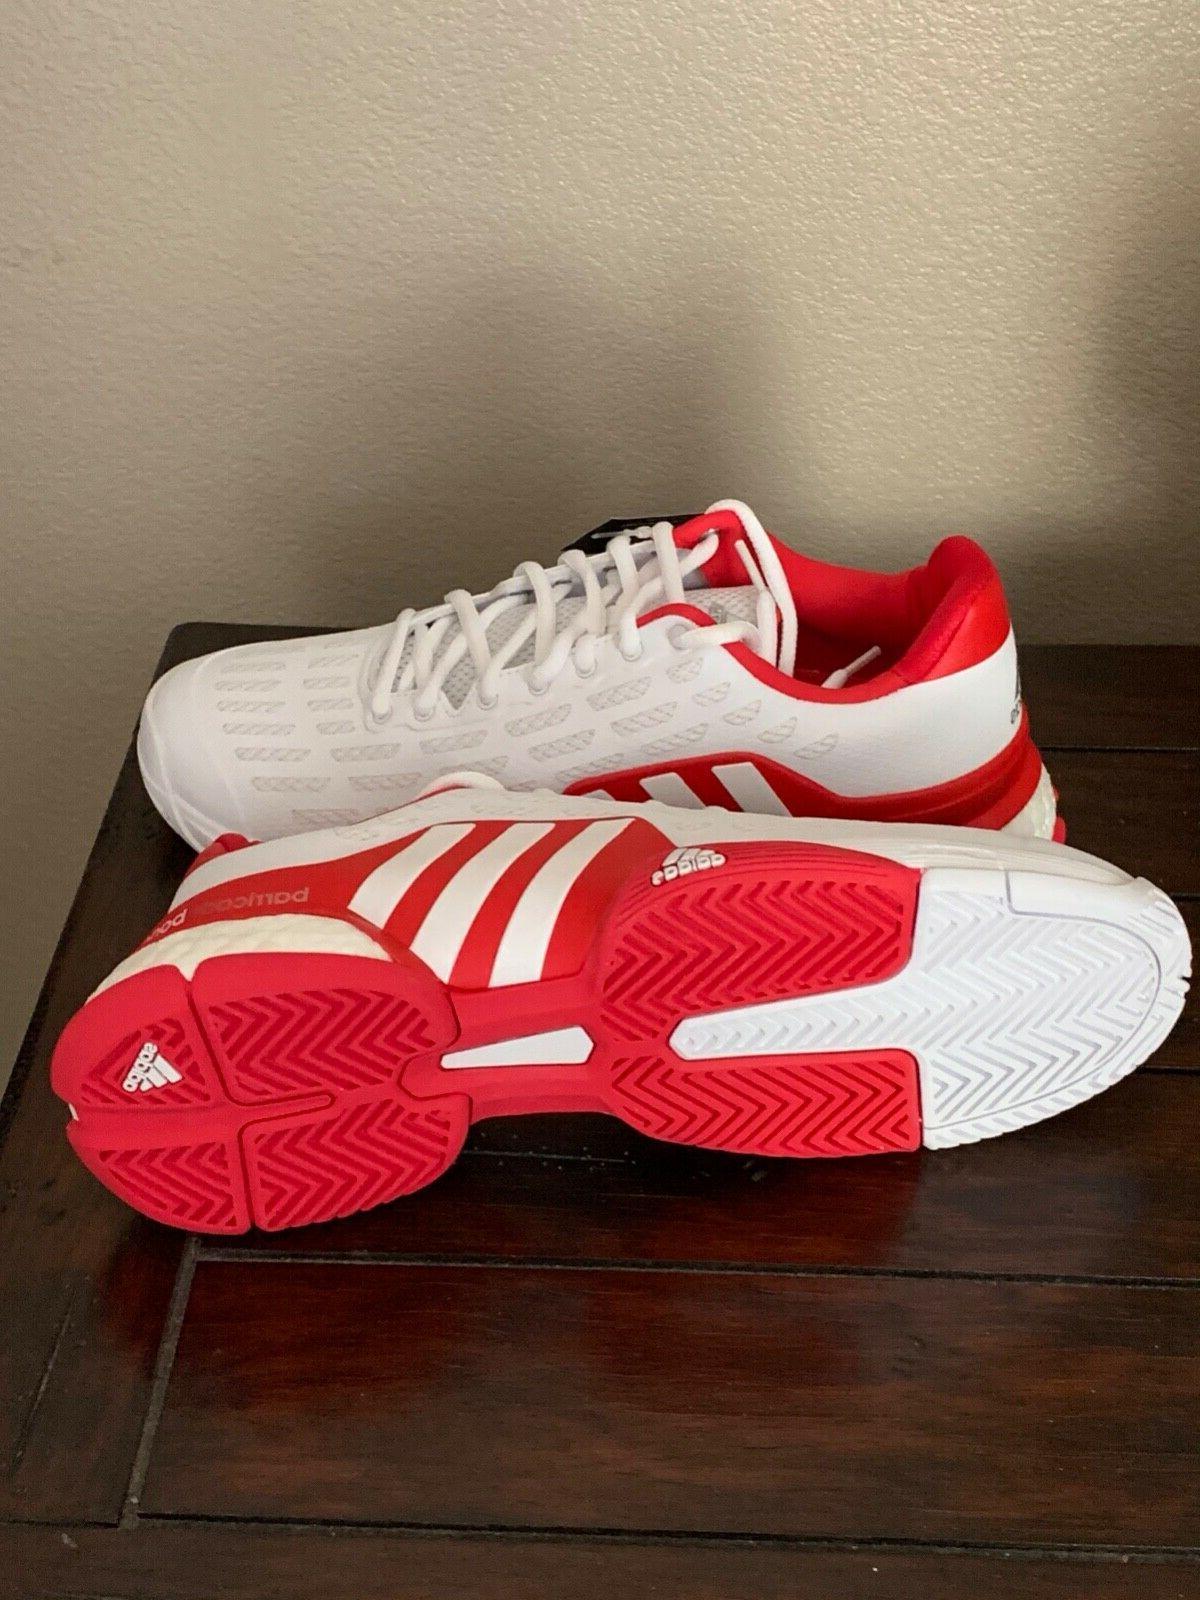 Adidas Men's Barricade Boost Tennis AQ2262